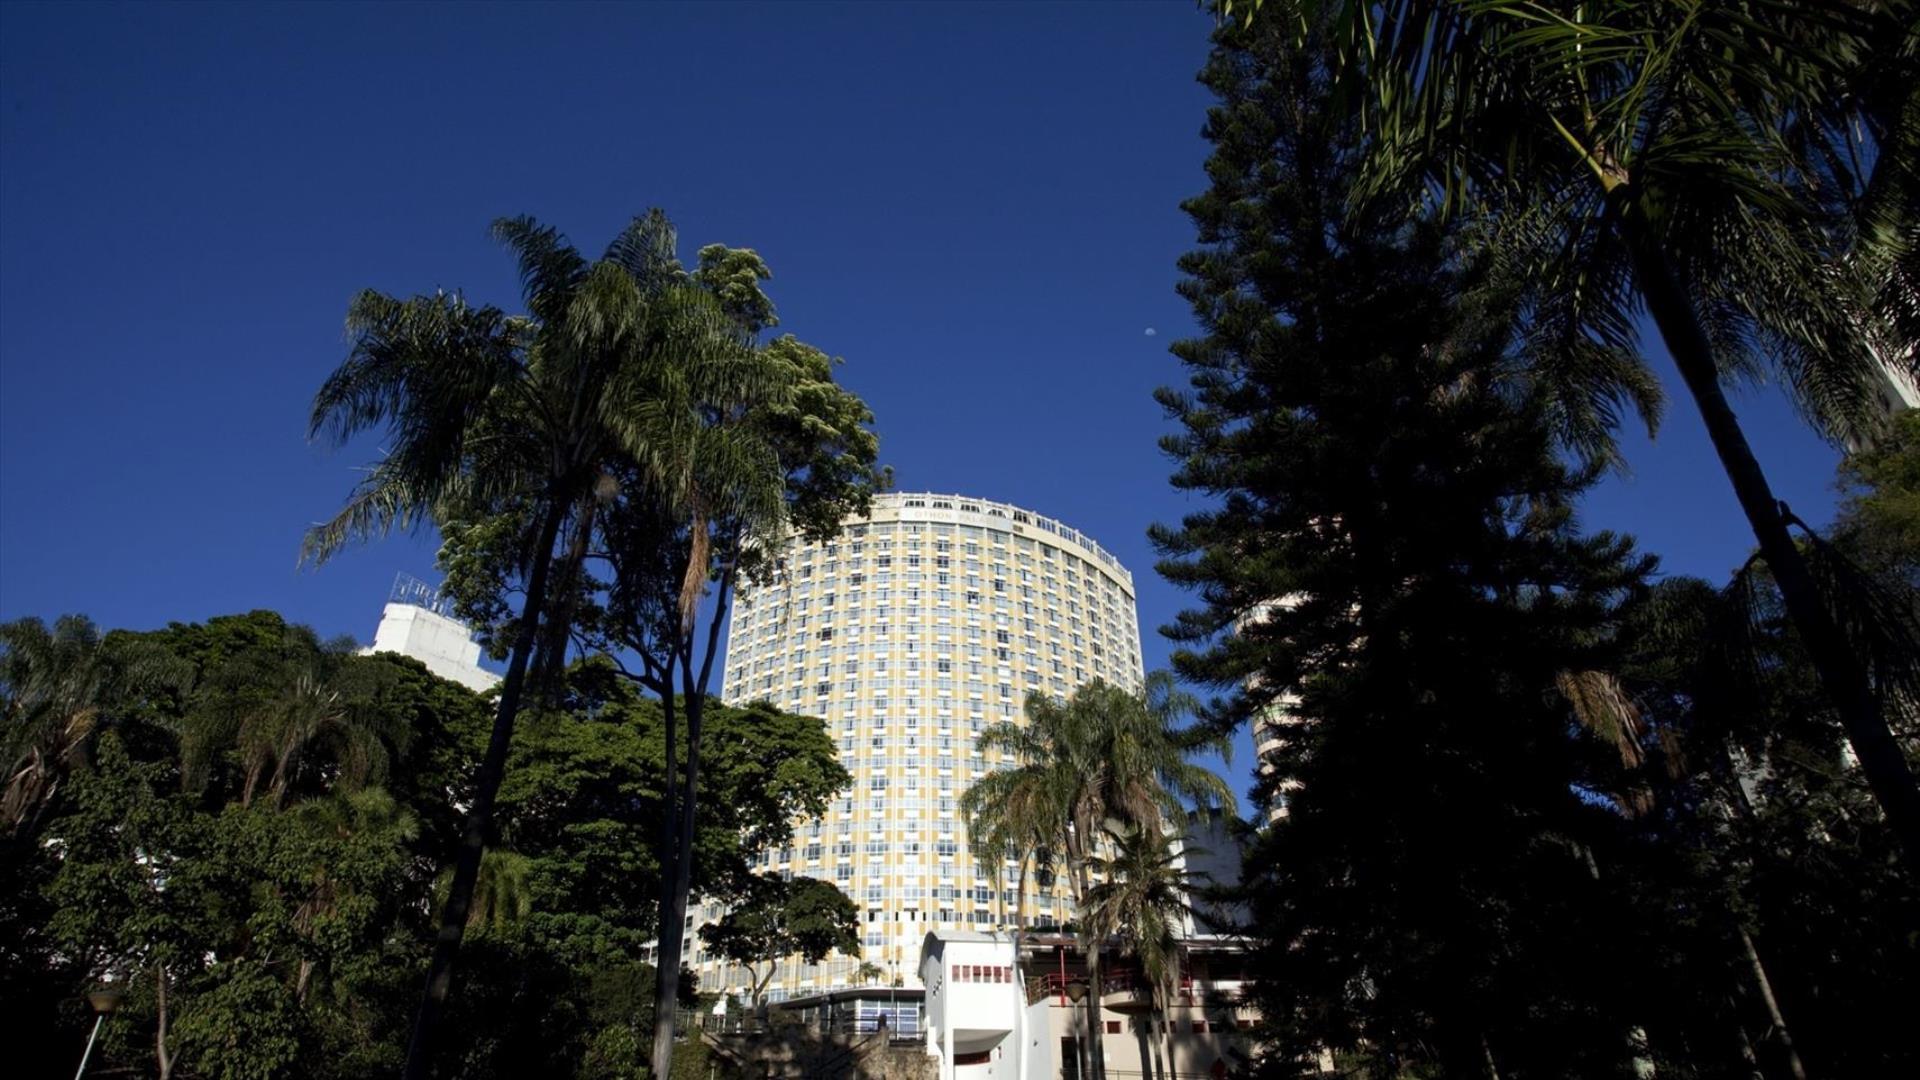 Brasilien Belo Horizonte: Superior Hotel - Hotel Belo Horizonte Othon Palace